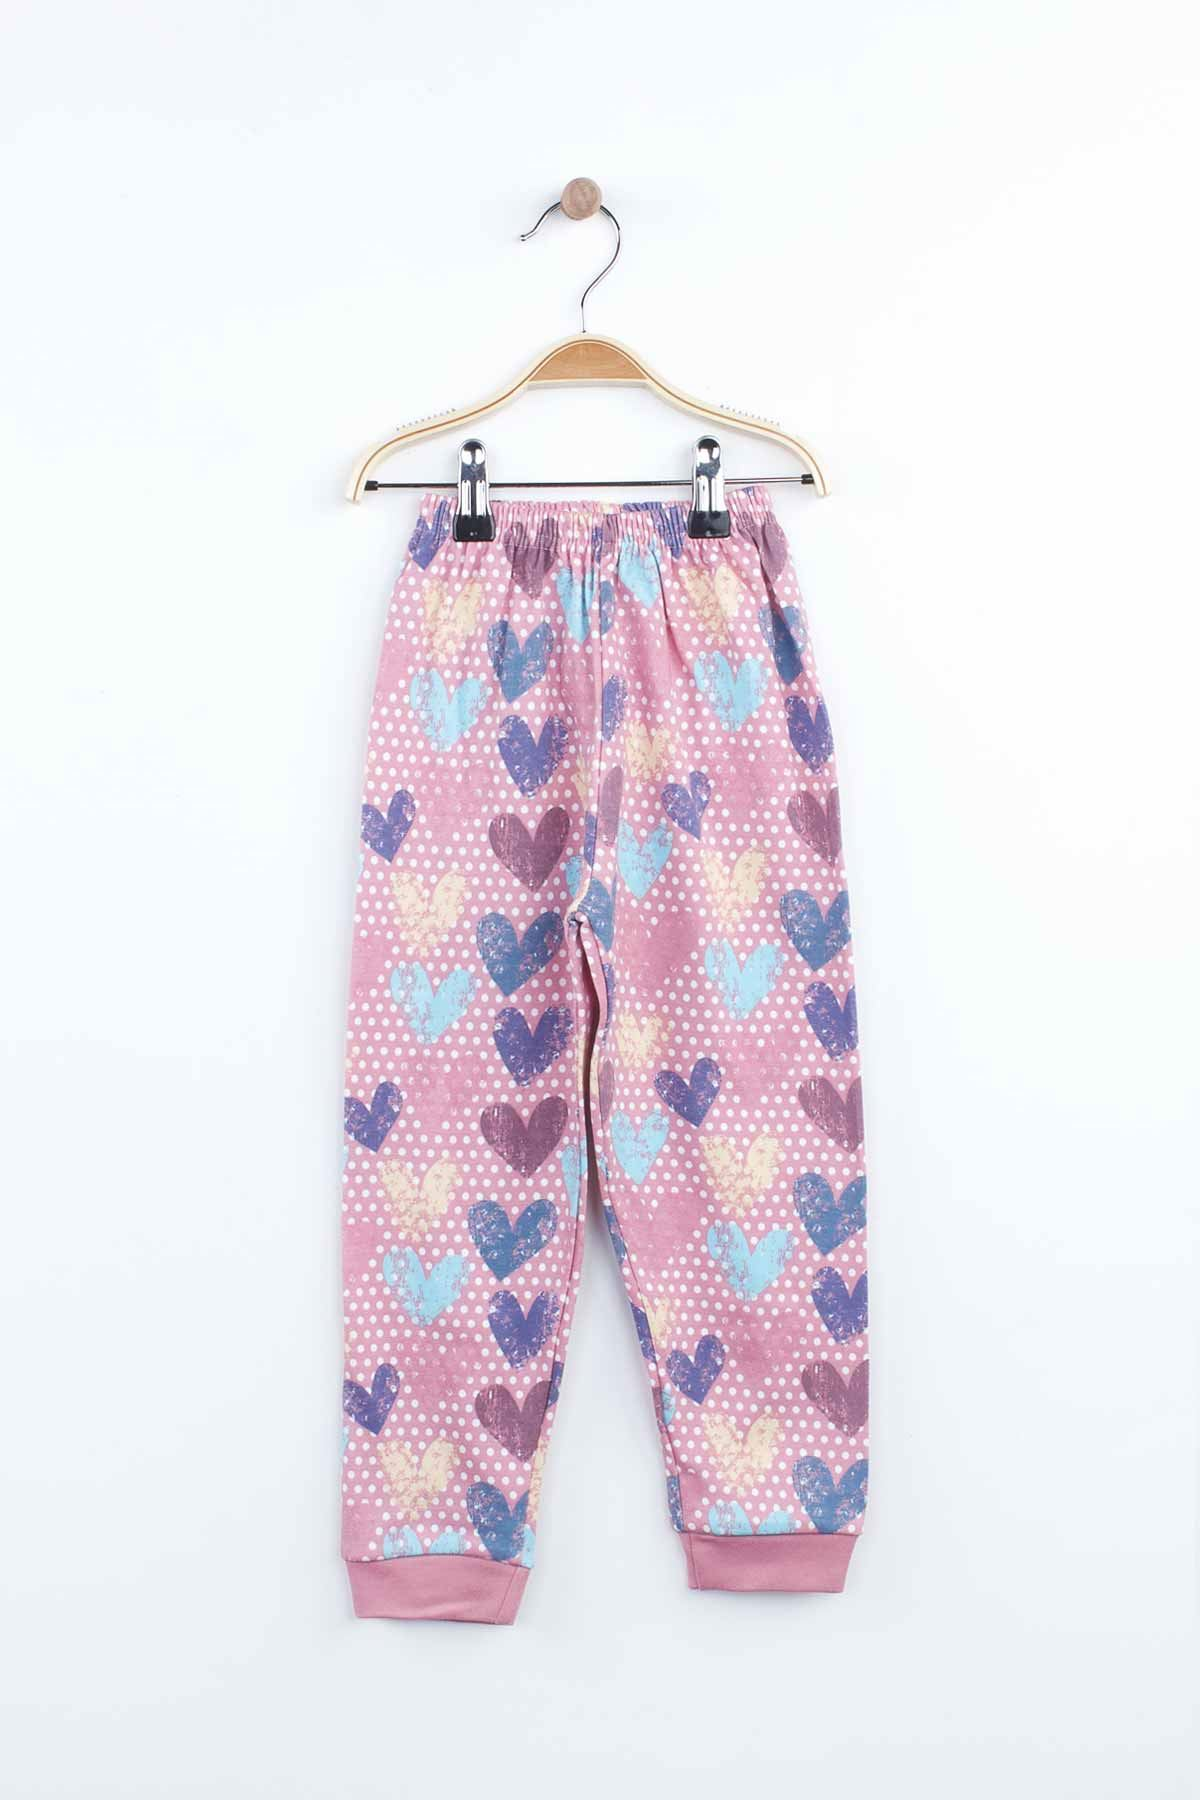 Lilac Girls Pajamas Set Bottom Pajamas Top Pajamas Kids Daily Wear Homewear Cotton Comfortable Children Pajamas Sets Models